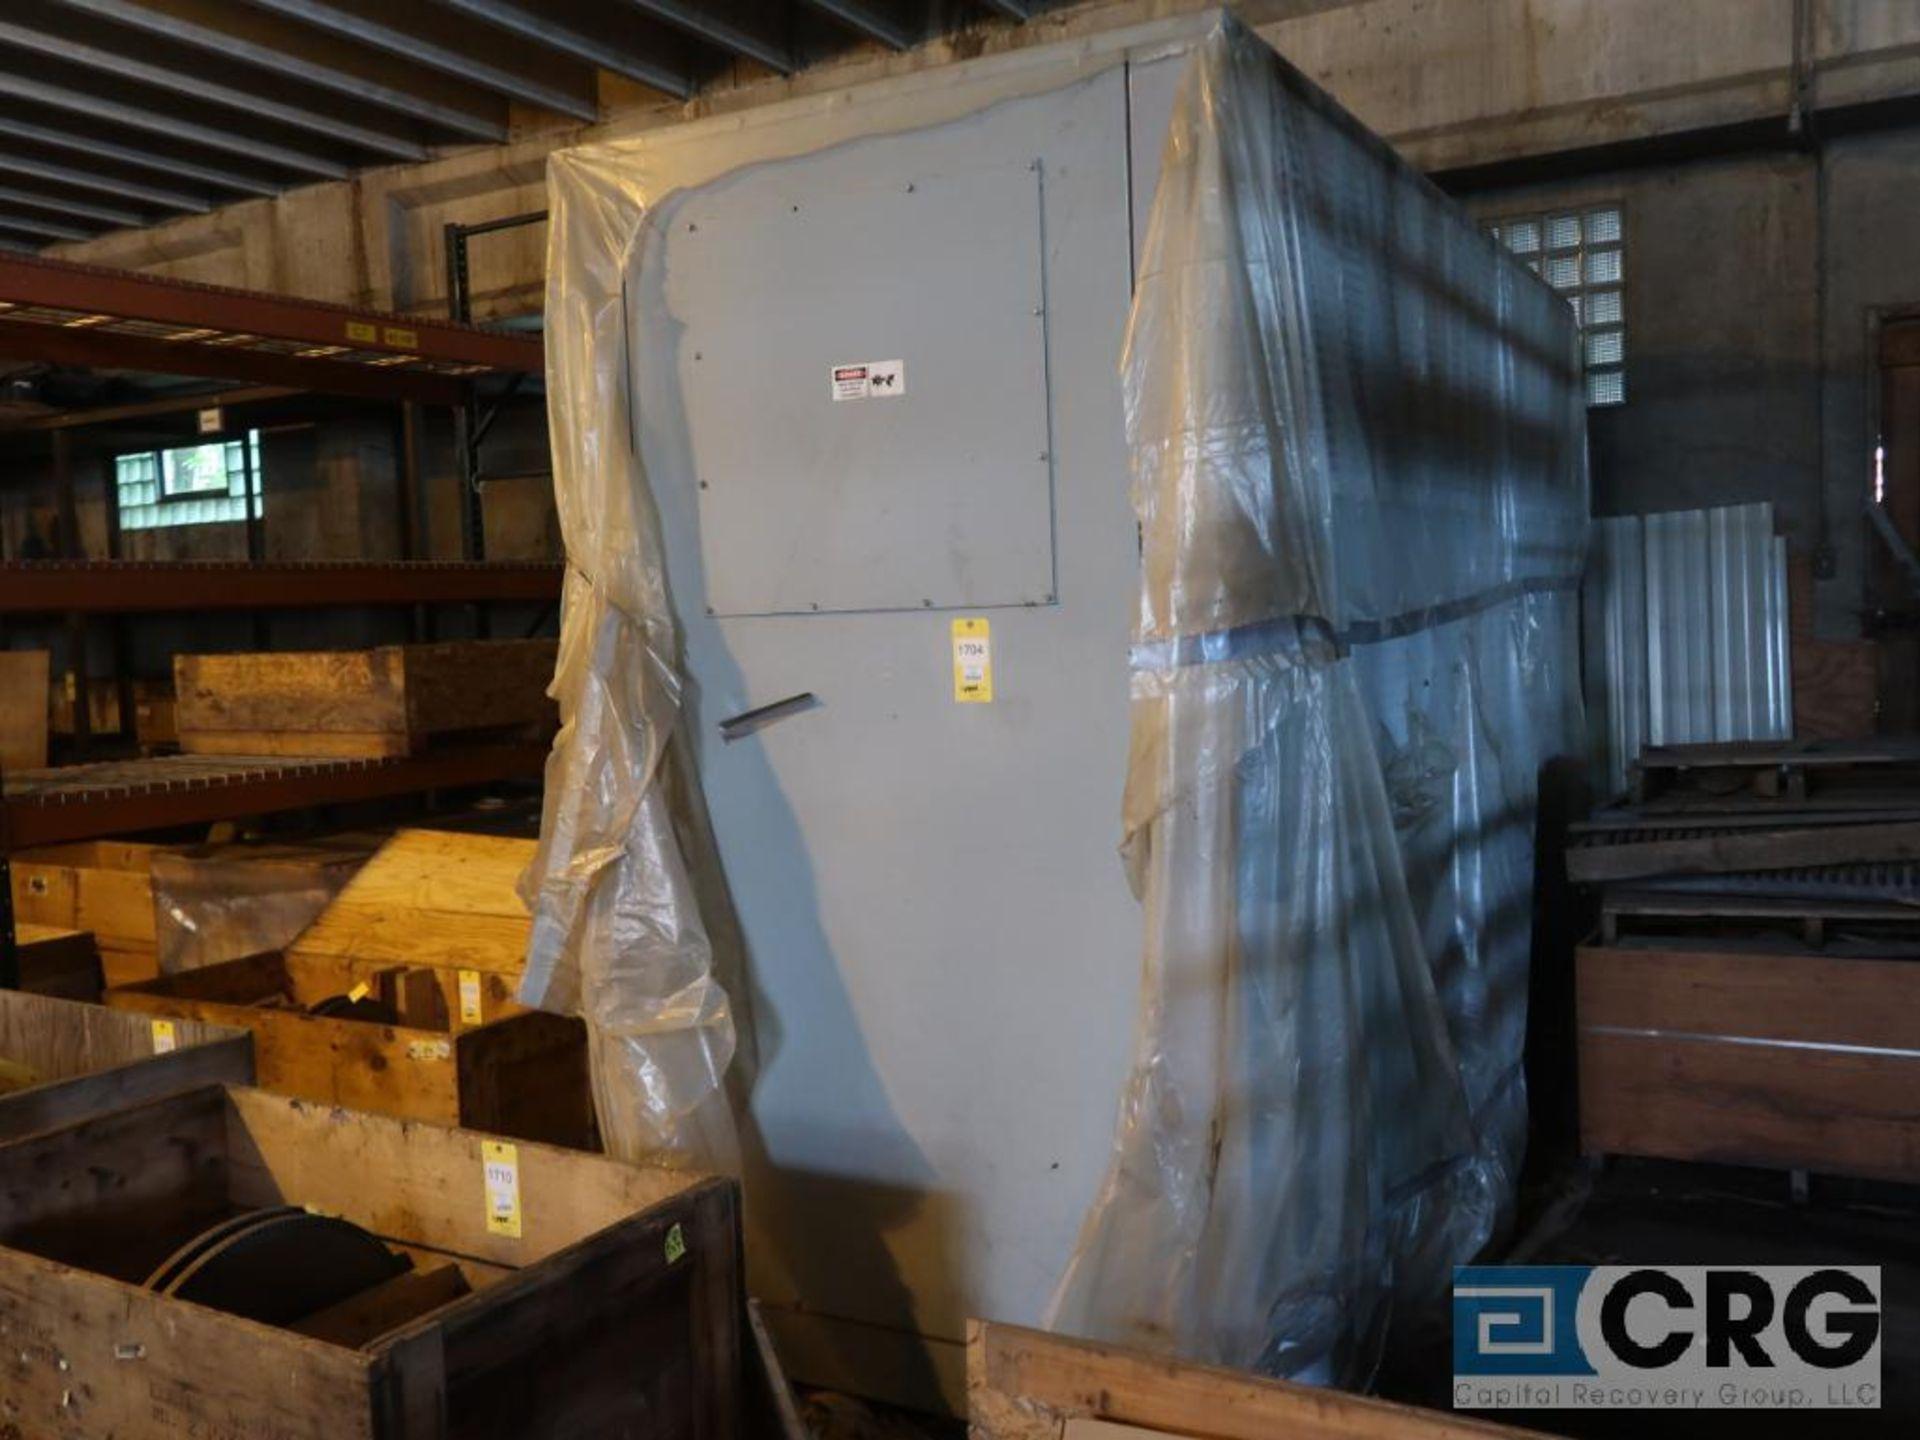 Uniclad 2000 KVA dry type transformer, 3 ph., HV 22860, BIL .125 KV, LV 480 GRDY/277 BIL. 10 KV, (5)